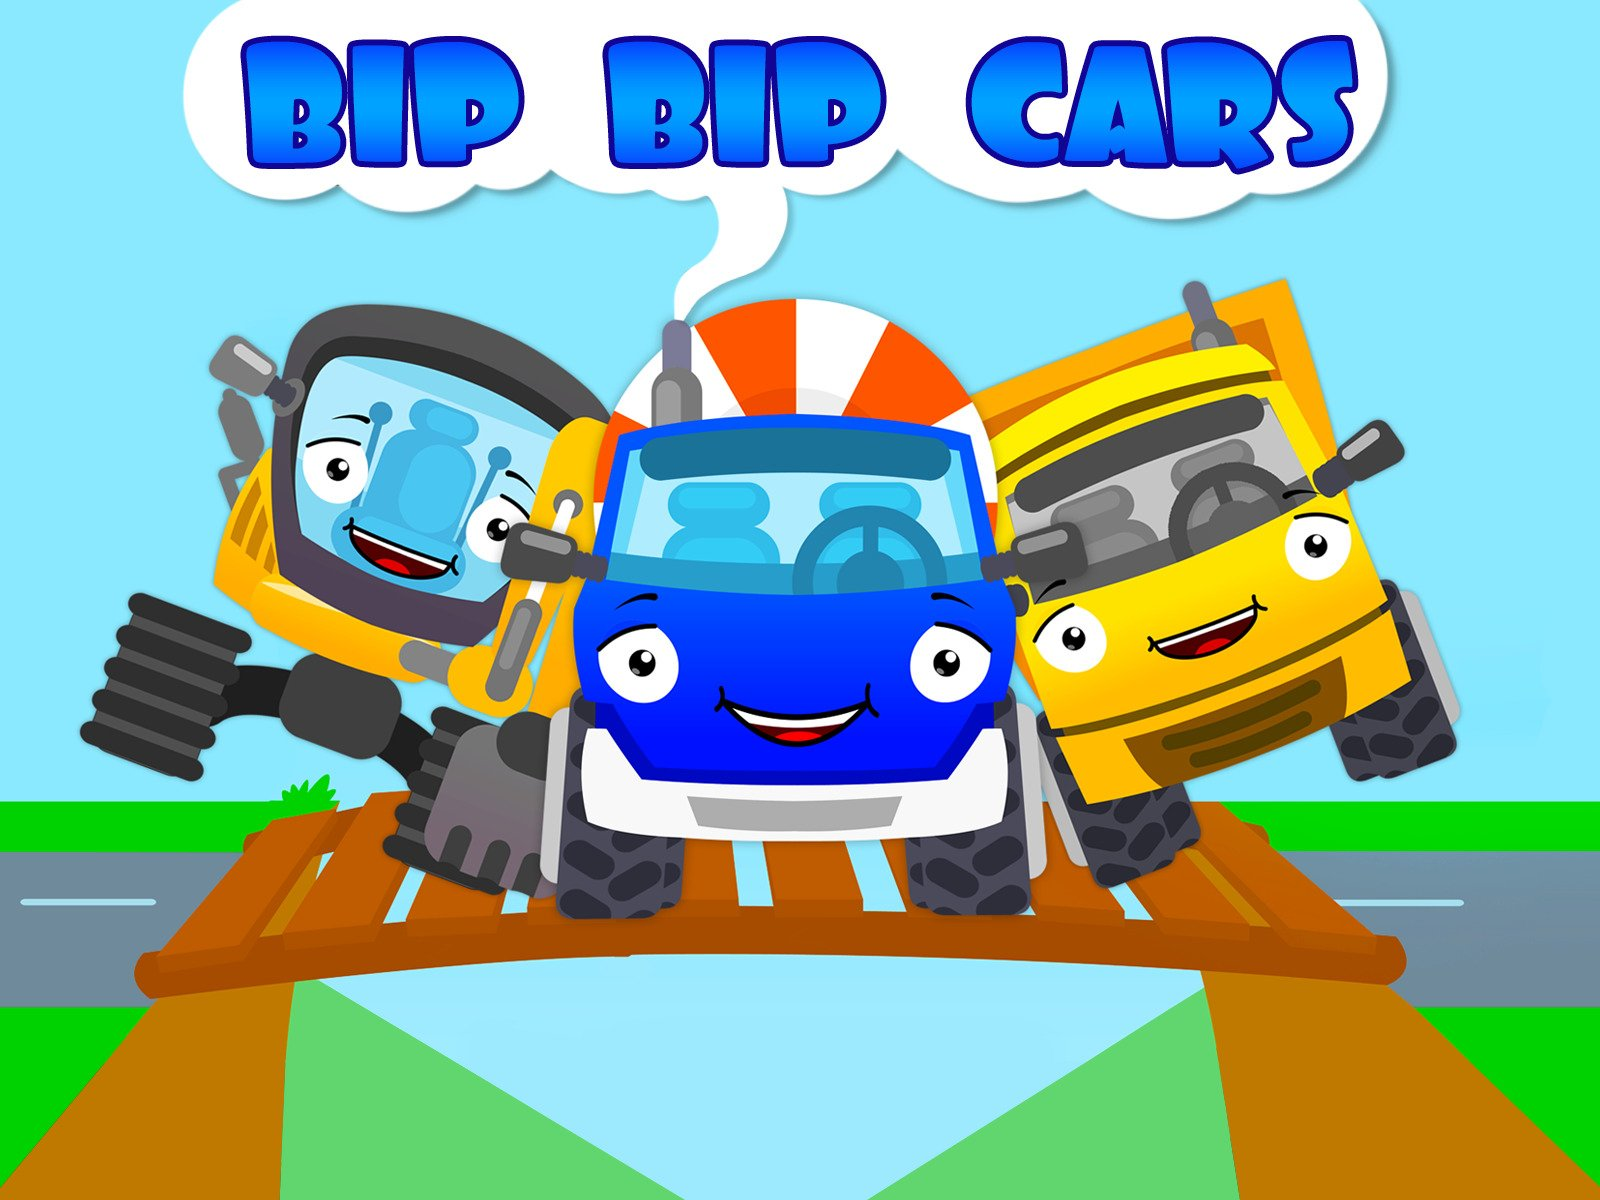 Bip Bip Cars - Season 2